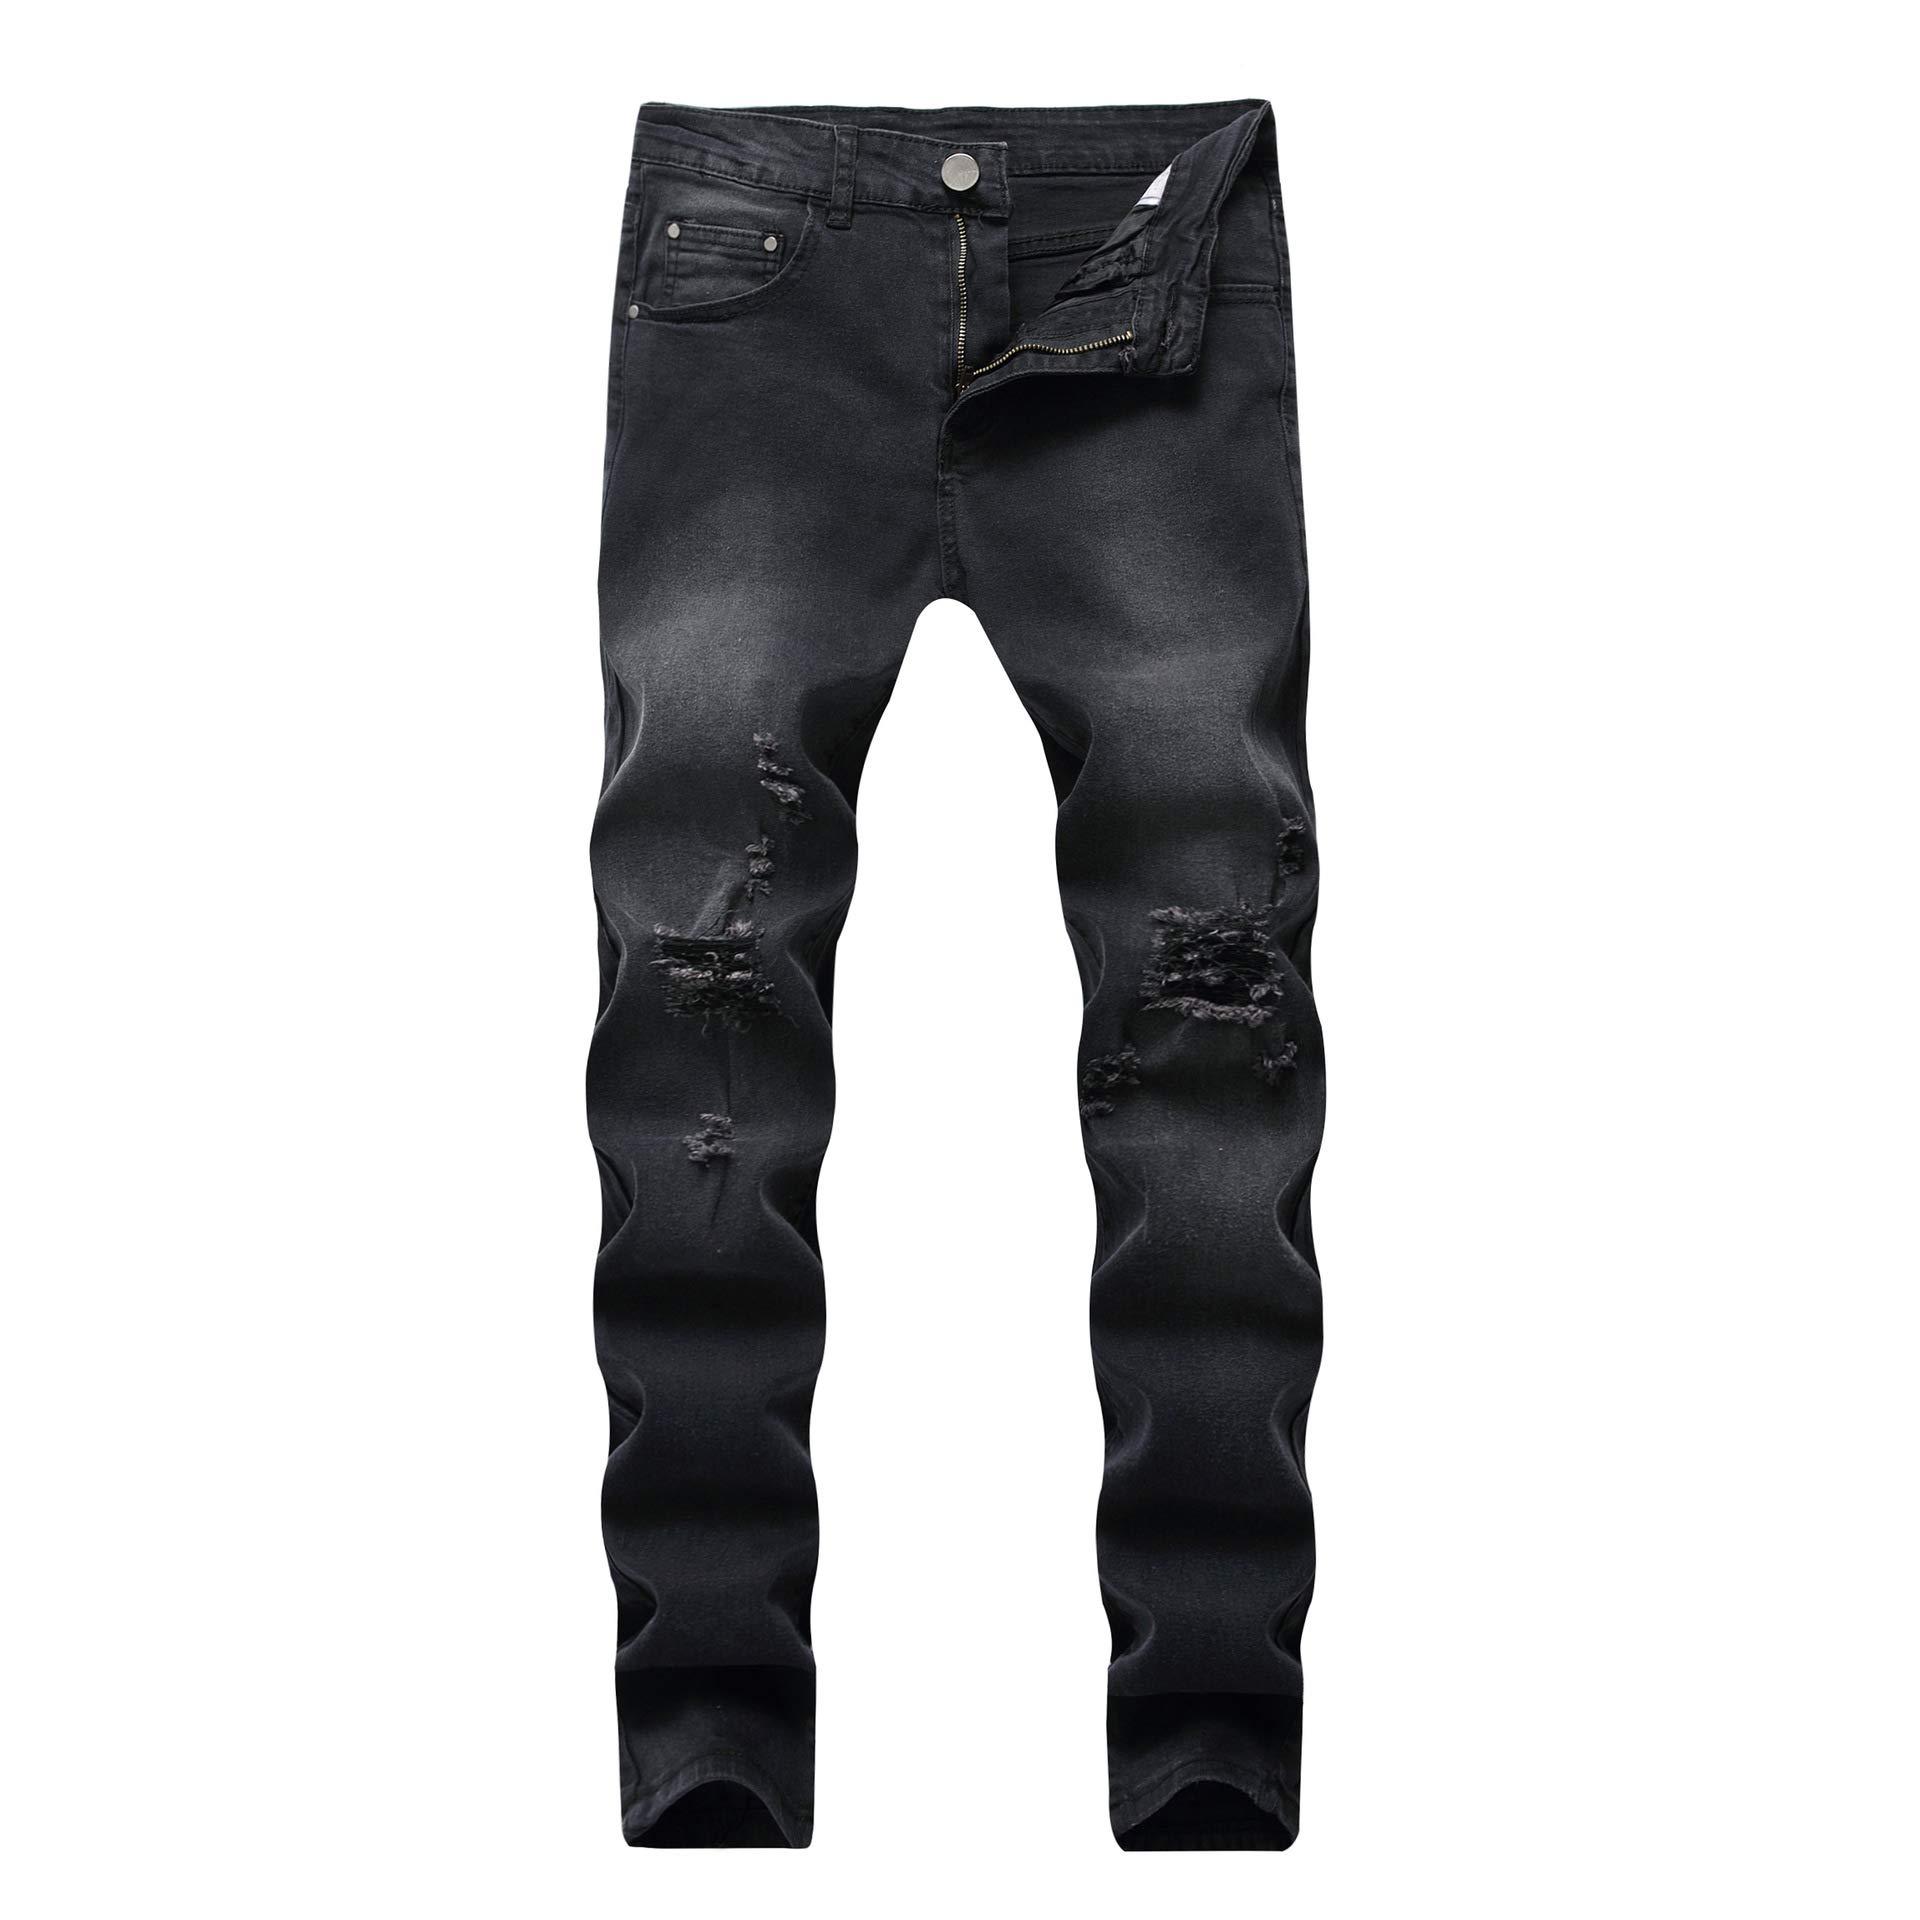 Boy's Dark Grey Stretch Skinny Fit Ripped Destroyed Distressed Fashion Slim Denim Jeans 10 by OBT